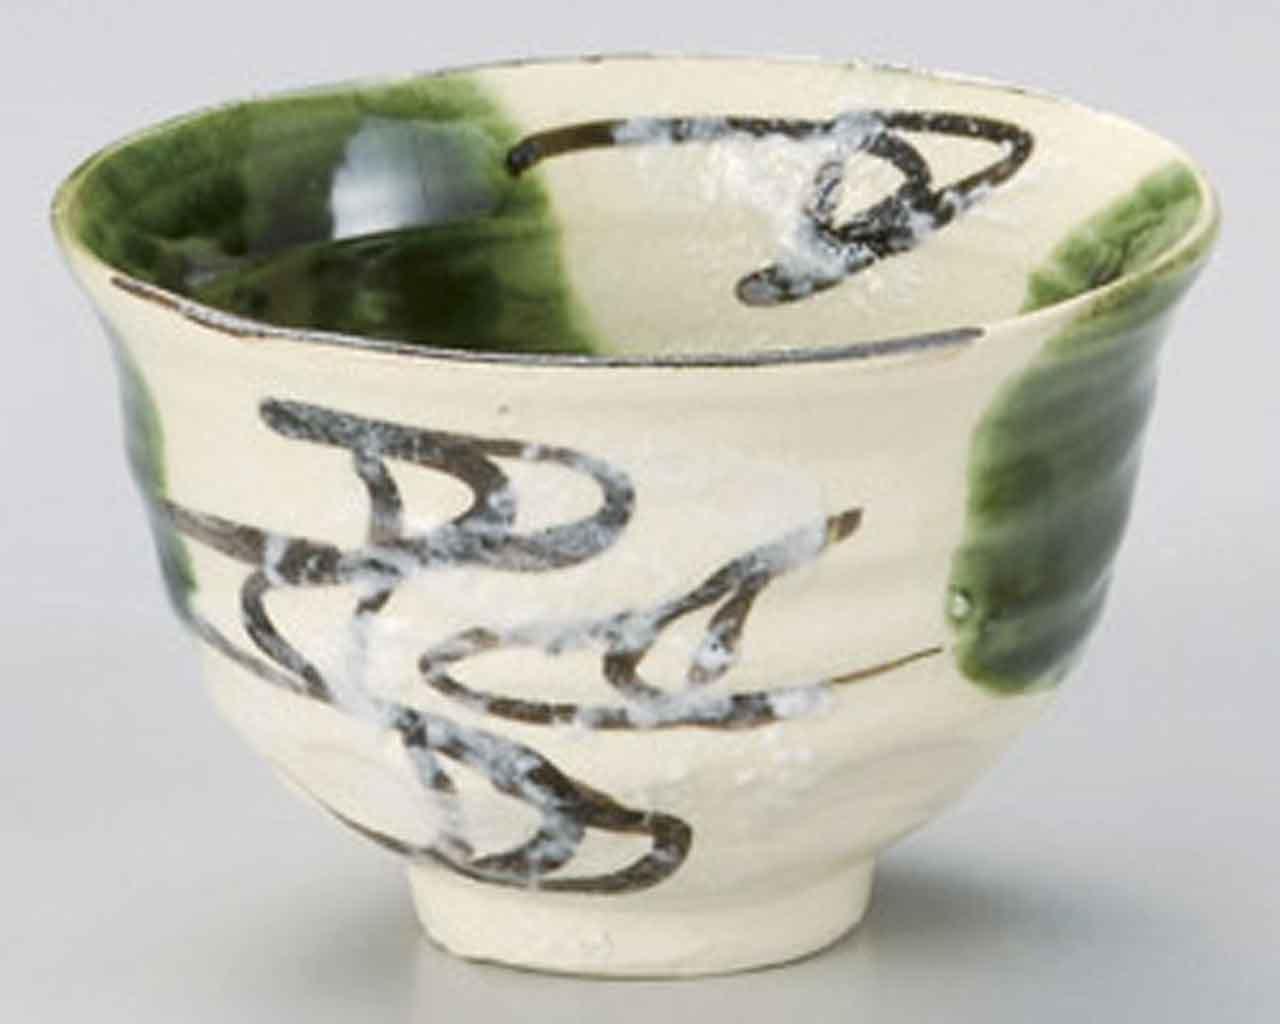 Oribe Ryusui 4.9inch Set of 10 Ramen-Bowls Beige Ceramic Made in Japan